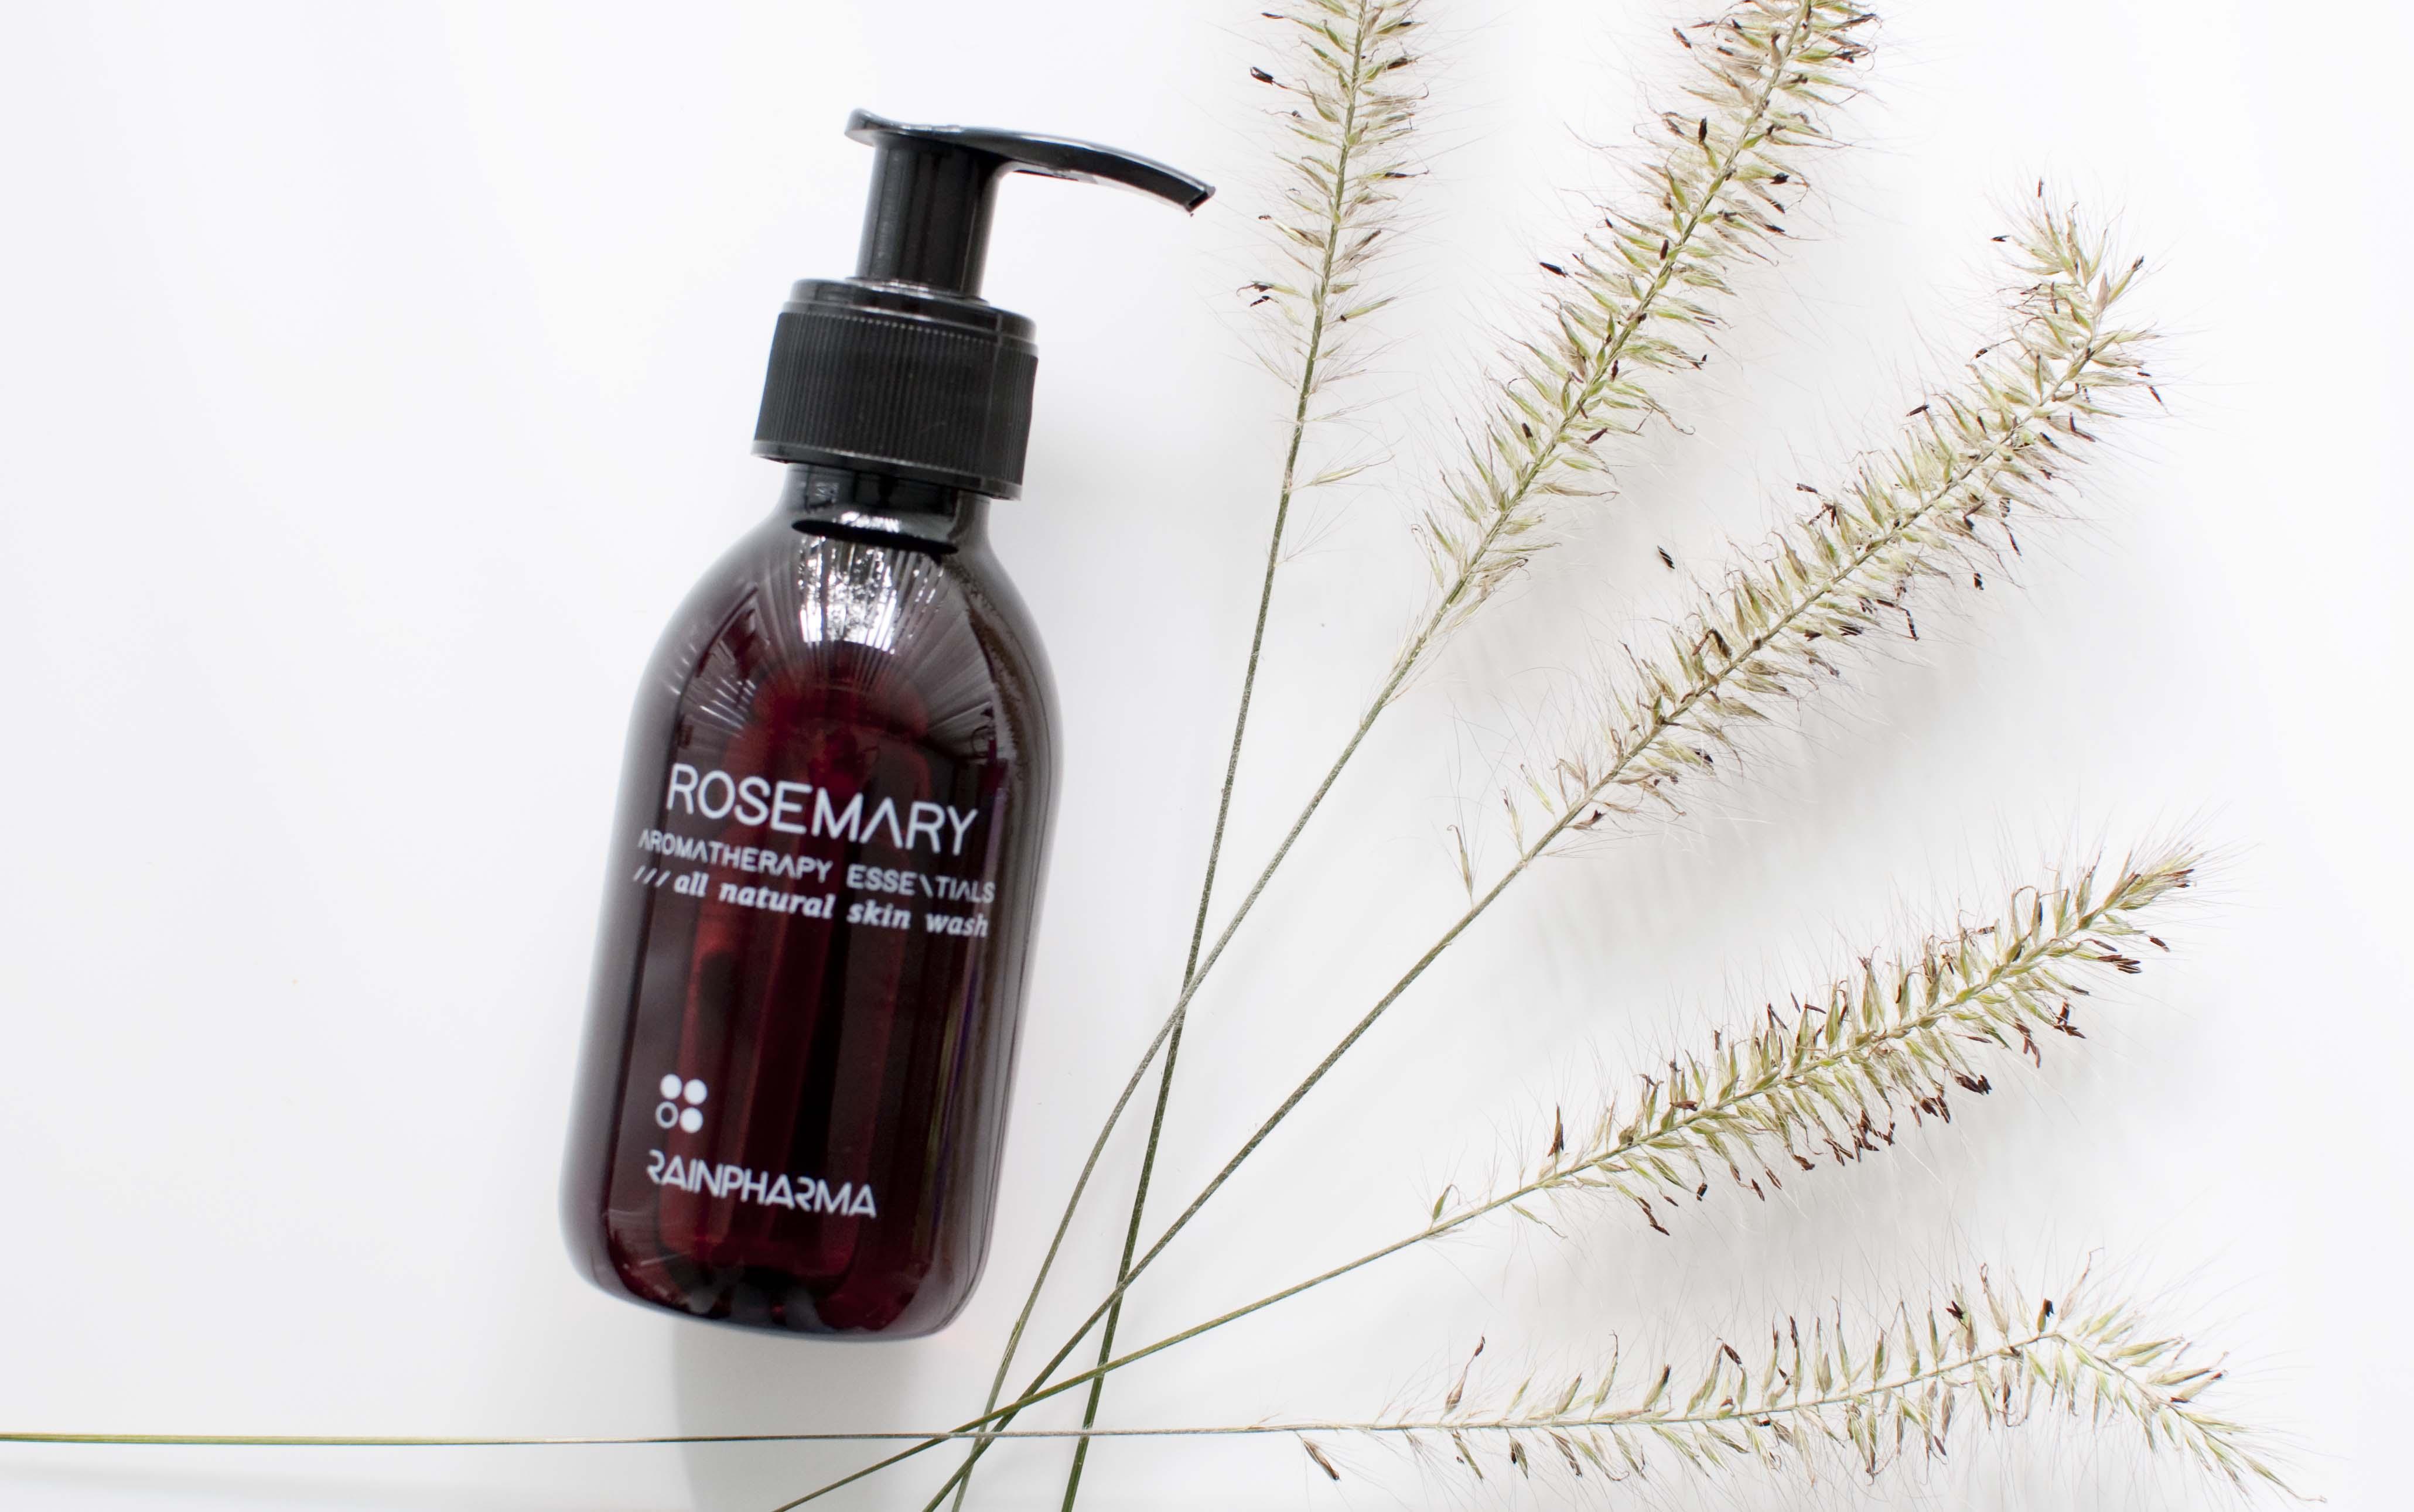 review-rainpharma-rosemary-skin-wash-aromatherapy